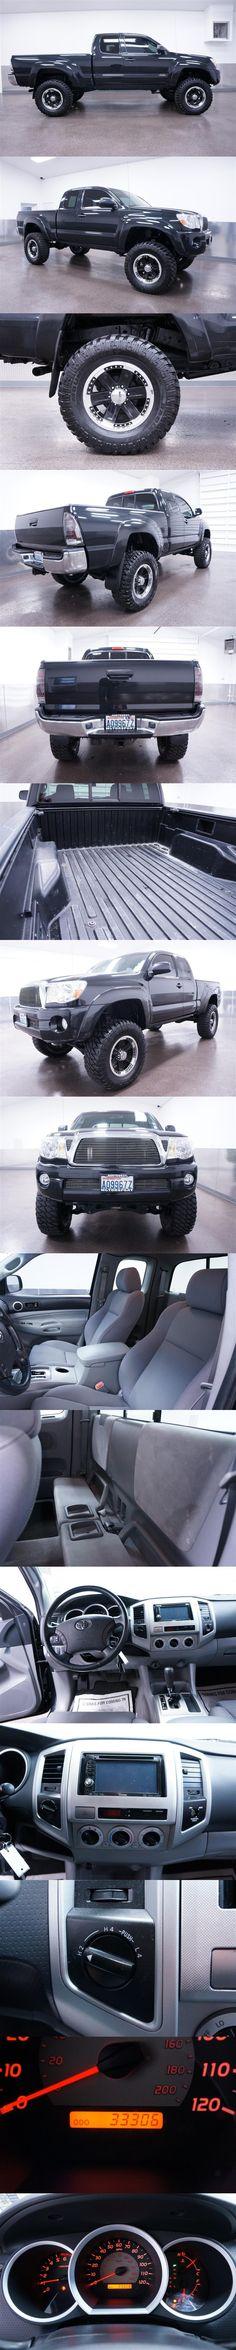 ☆ 2007 Toyota Tacoma 4x4 Lifted Truck/Trucks ☆ Nav & Low Miles!